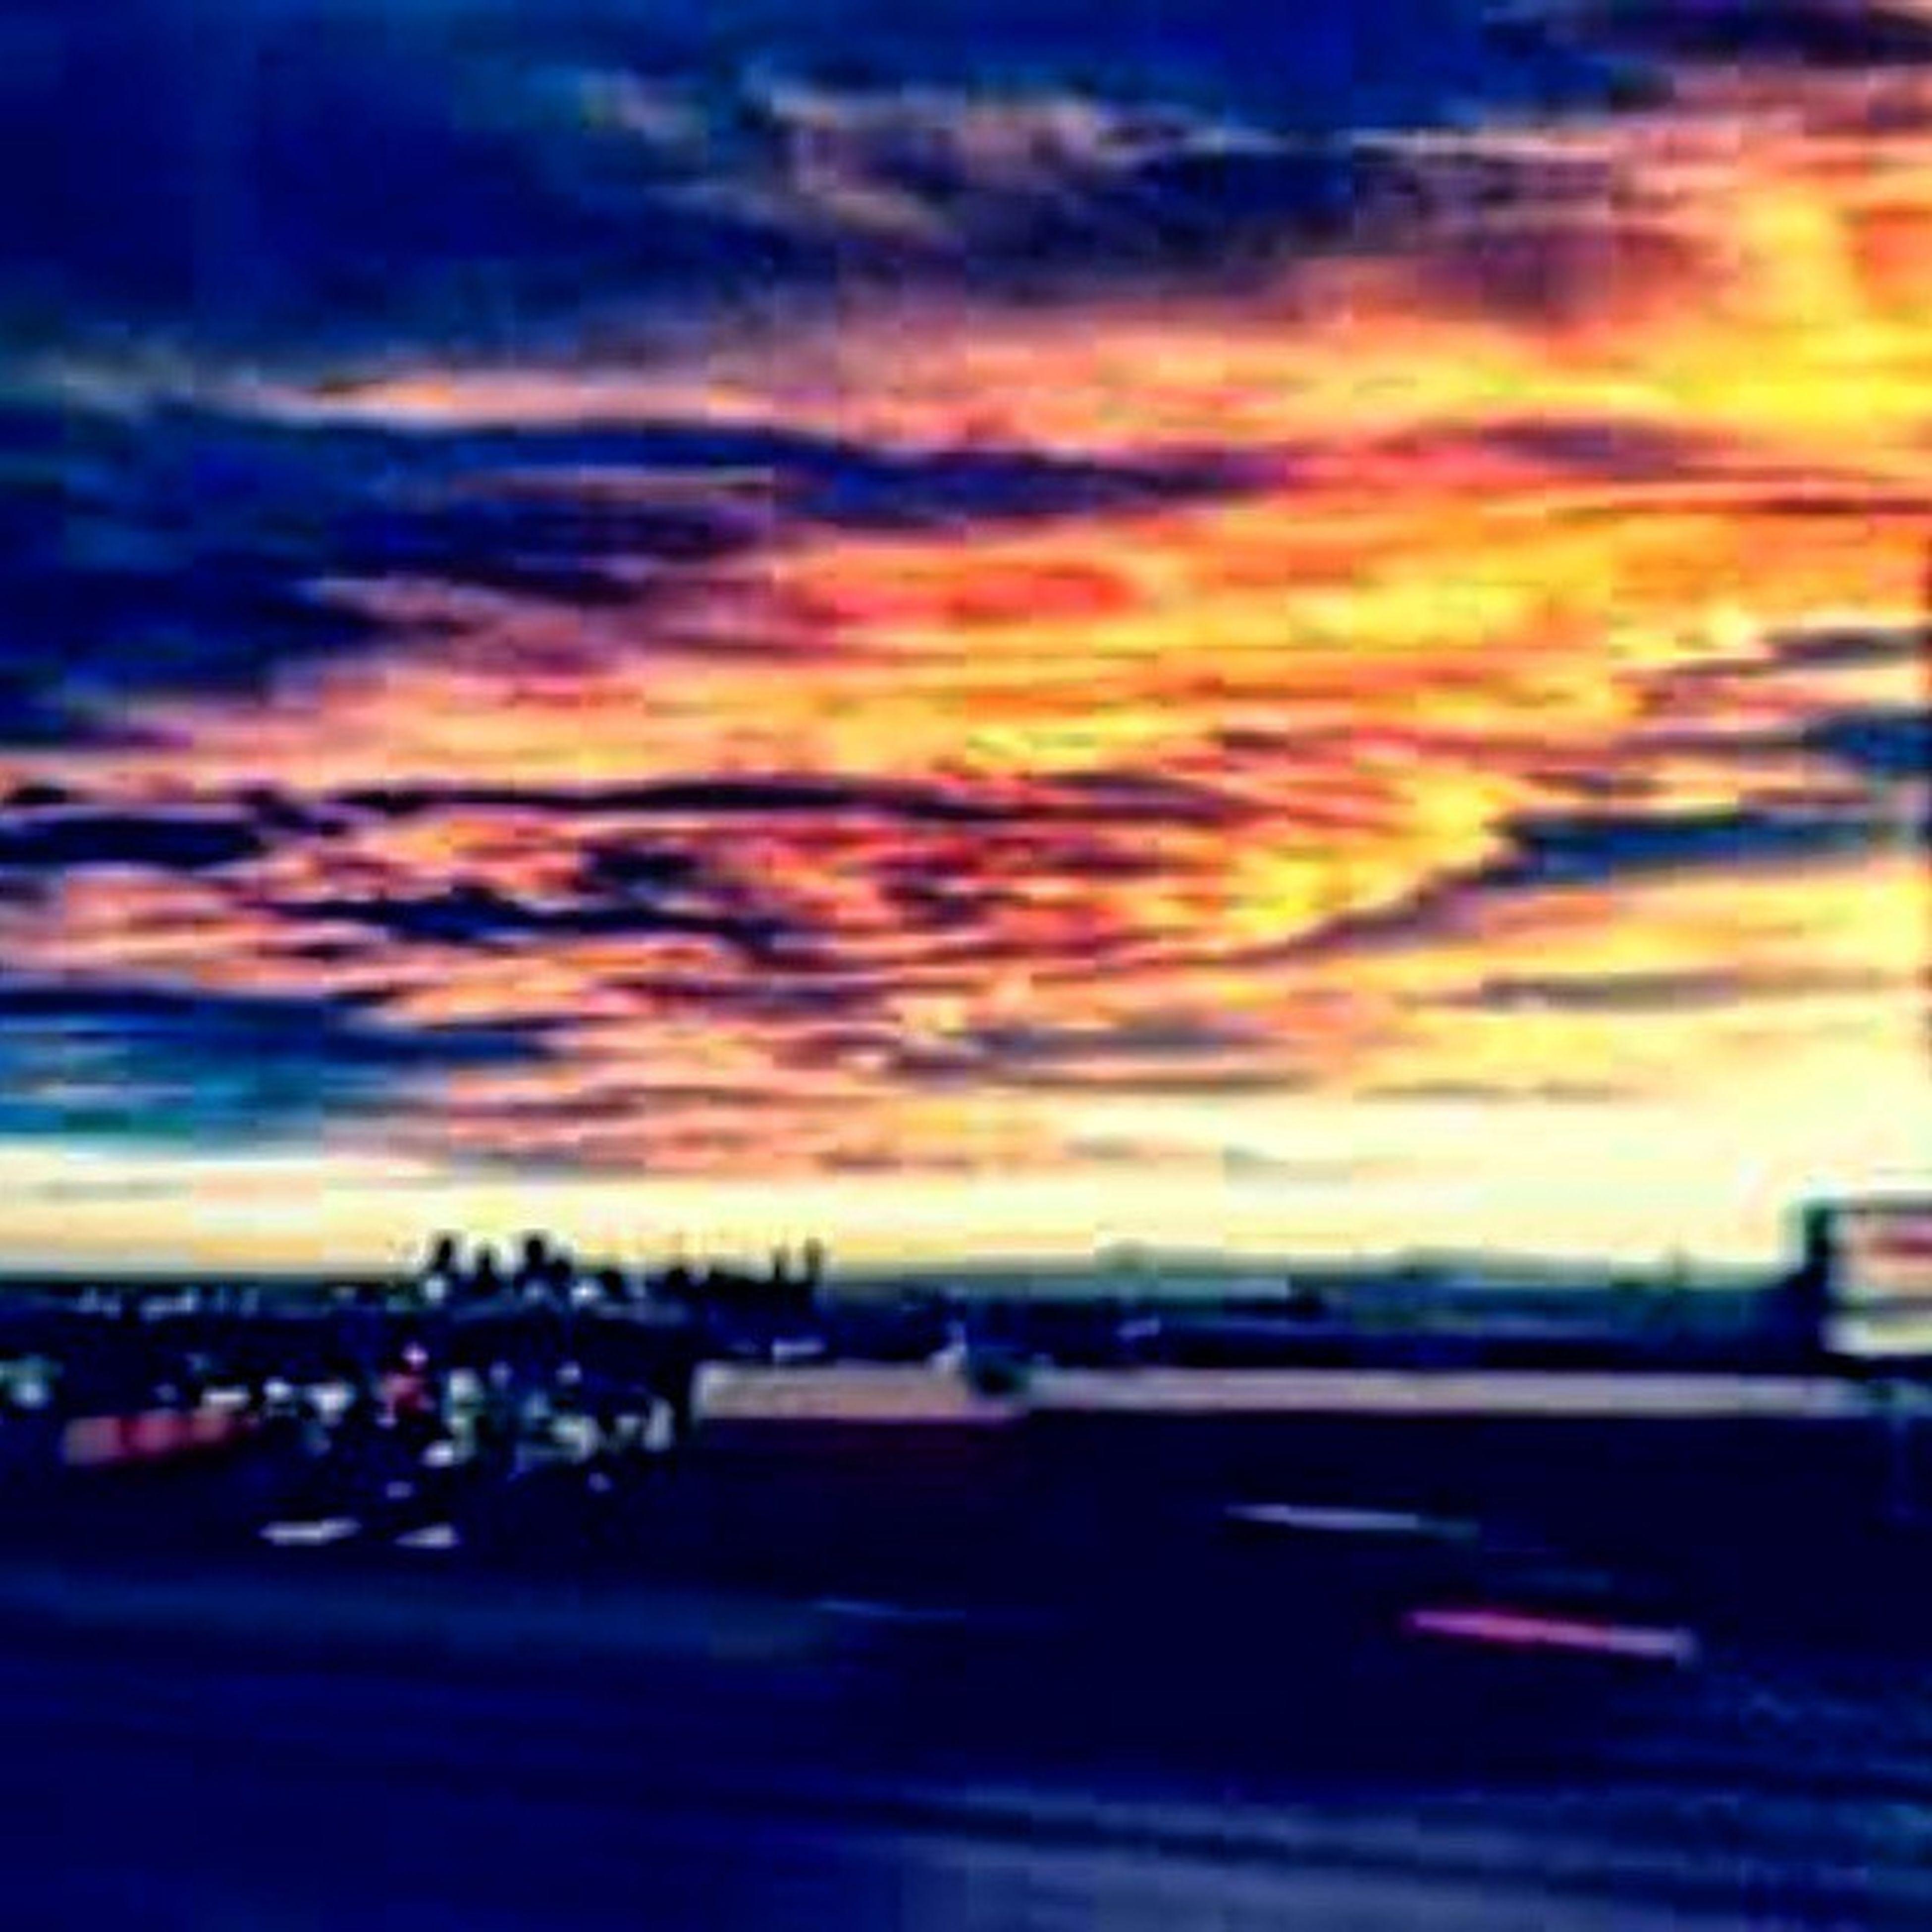 sky, cloud - sky, sunset, cloudy, dramatic sky, cloud, dusk, weather, orange color, multi colored, outdoors, transportation, beauty in nature, nature, moody sky, scenics, city, overcast, storm cloud, cloudscape